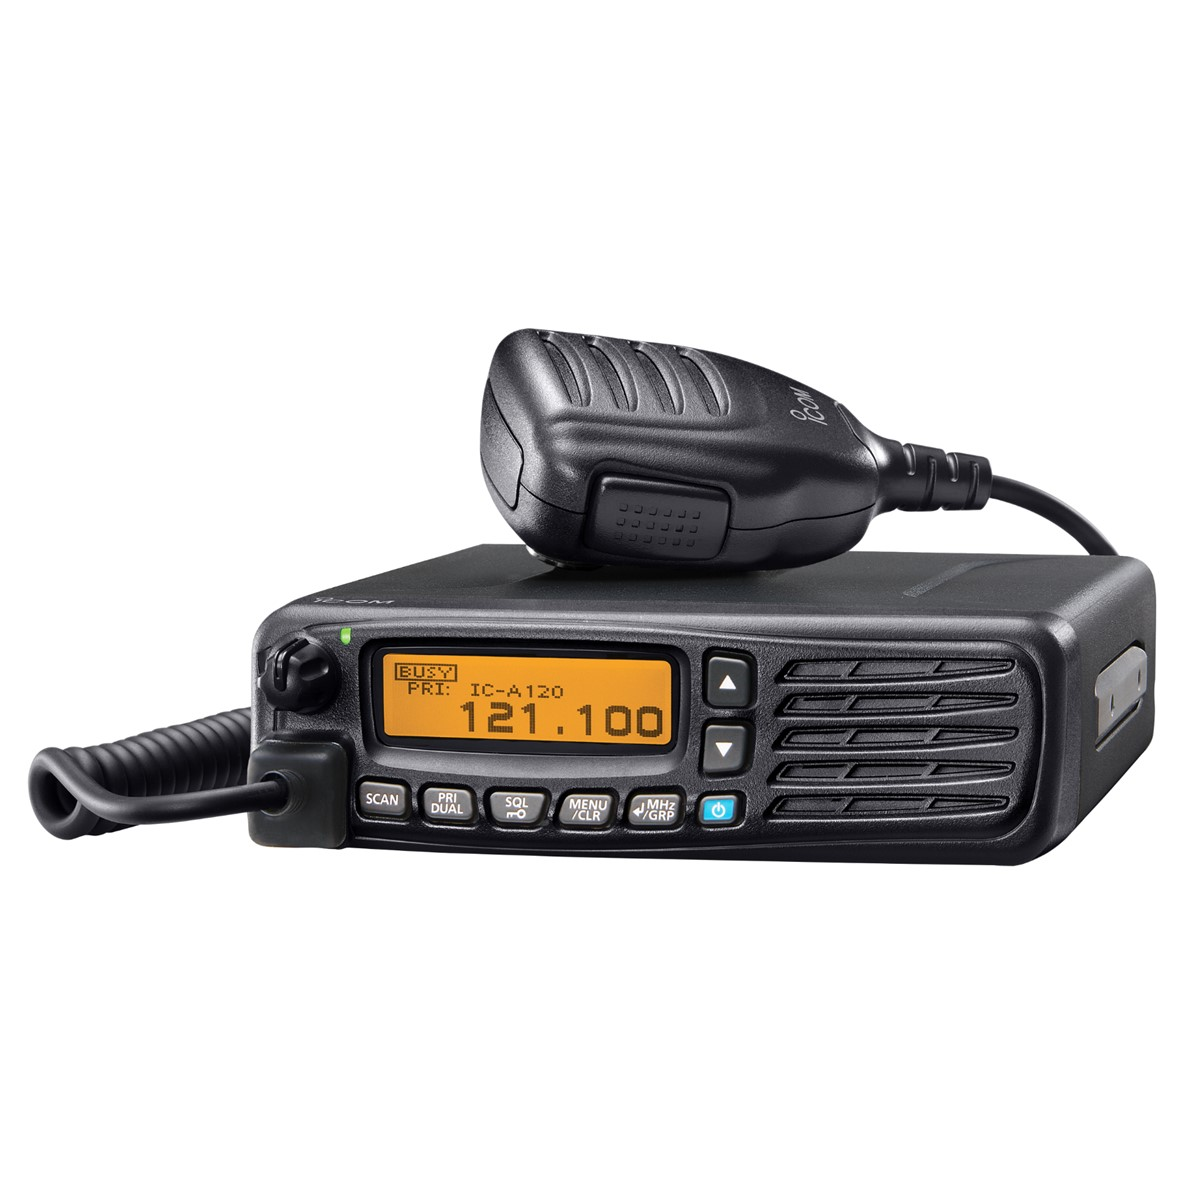 Radio Icom IC-A120 Analógico